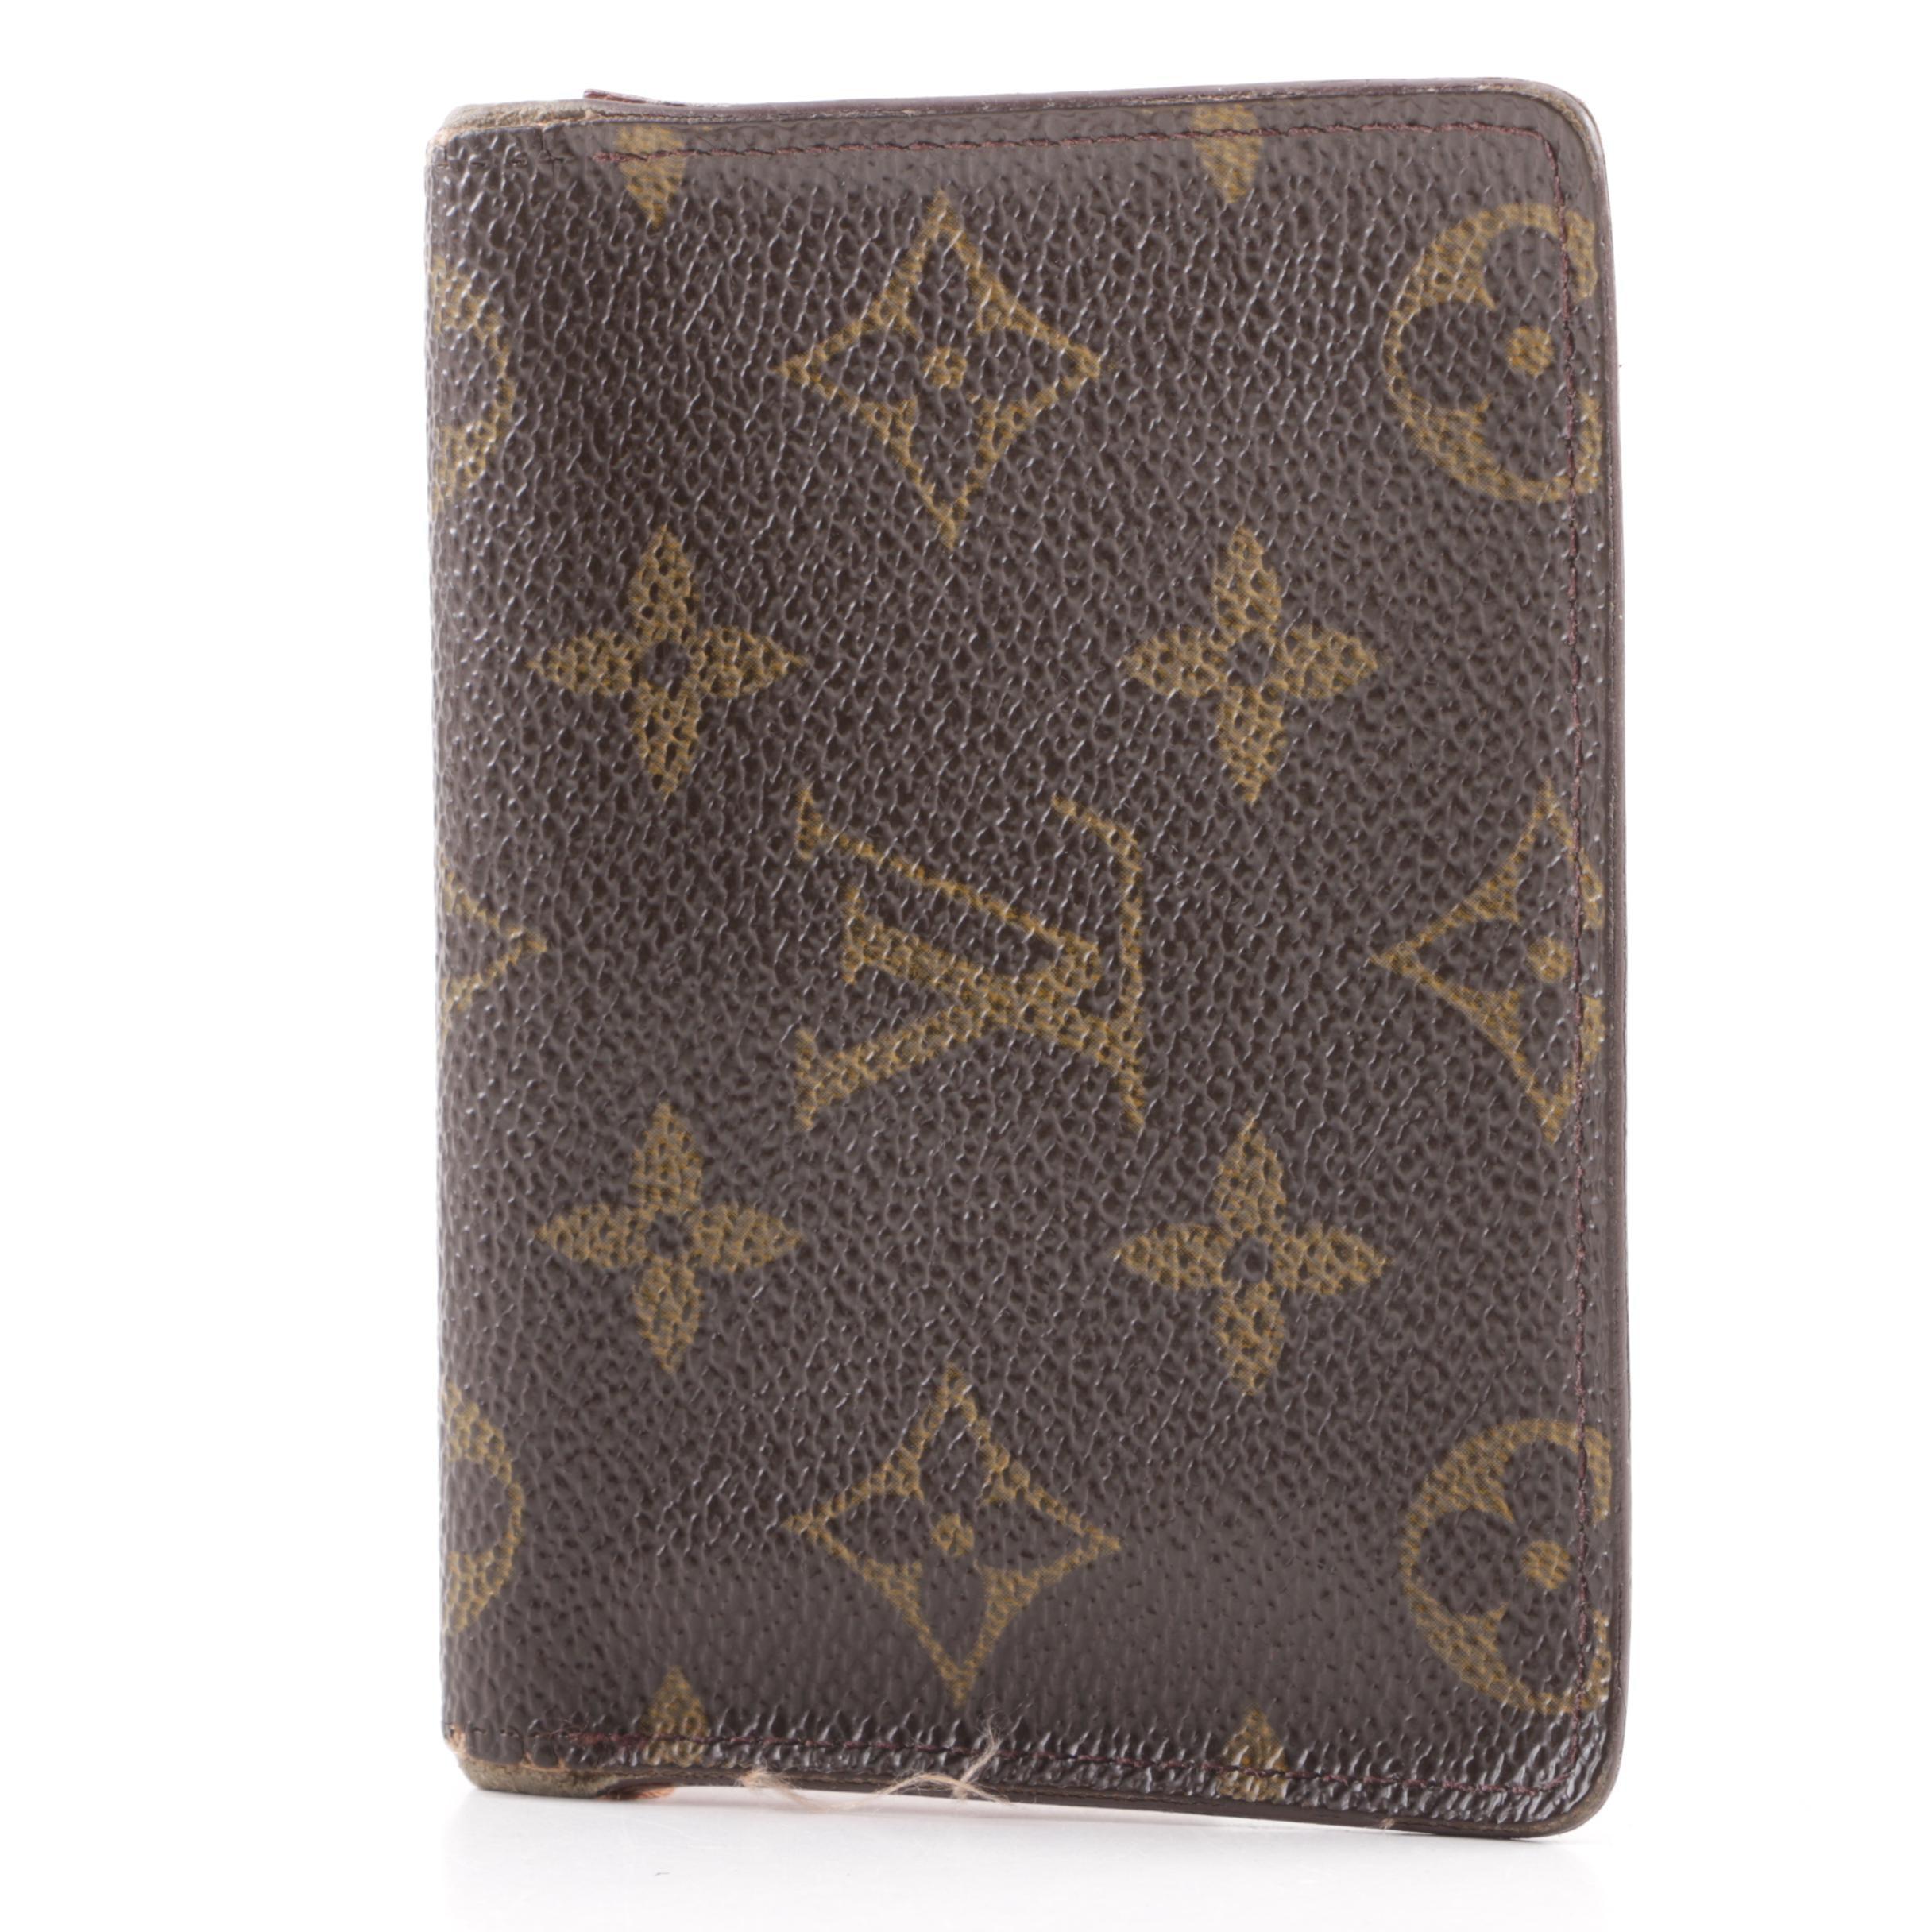 2000 Louis Vuitton Monogram Canvas Bifold ID Case